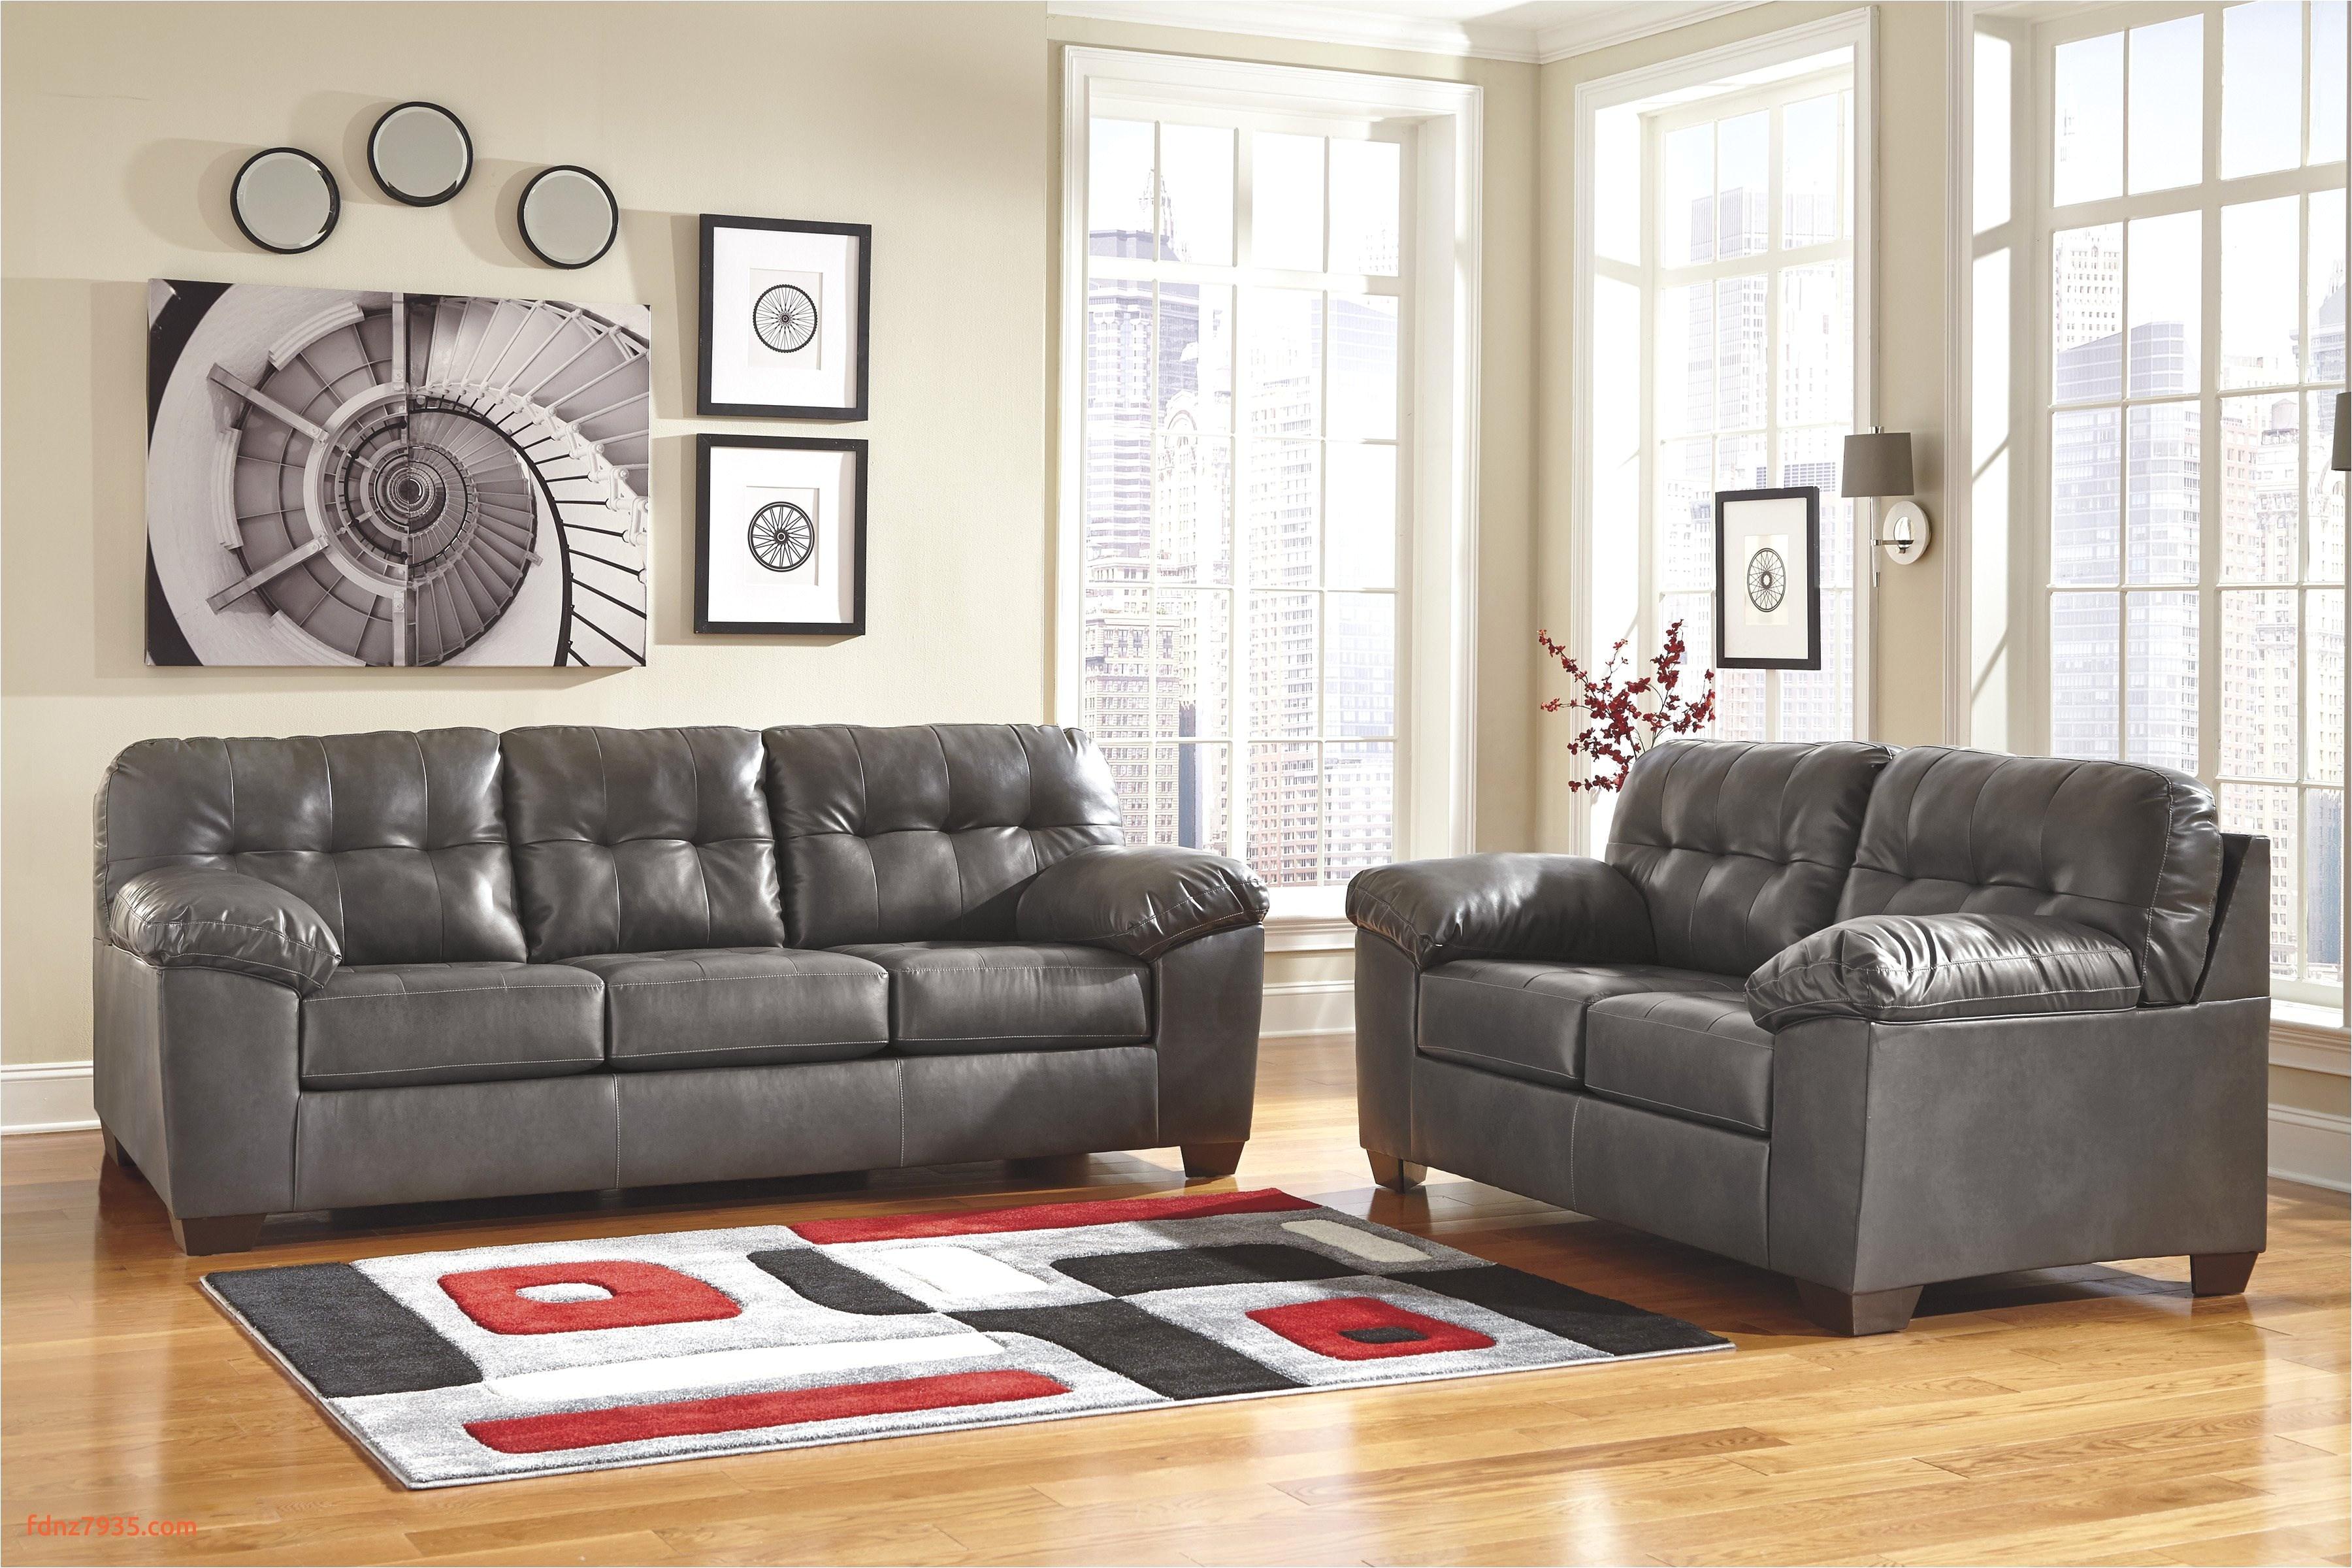 full size of home designbest of ashley furniture gray sectional ashley furniture gray sectional